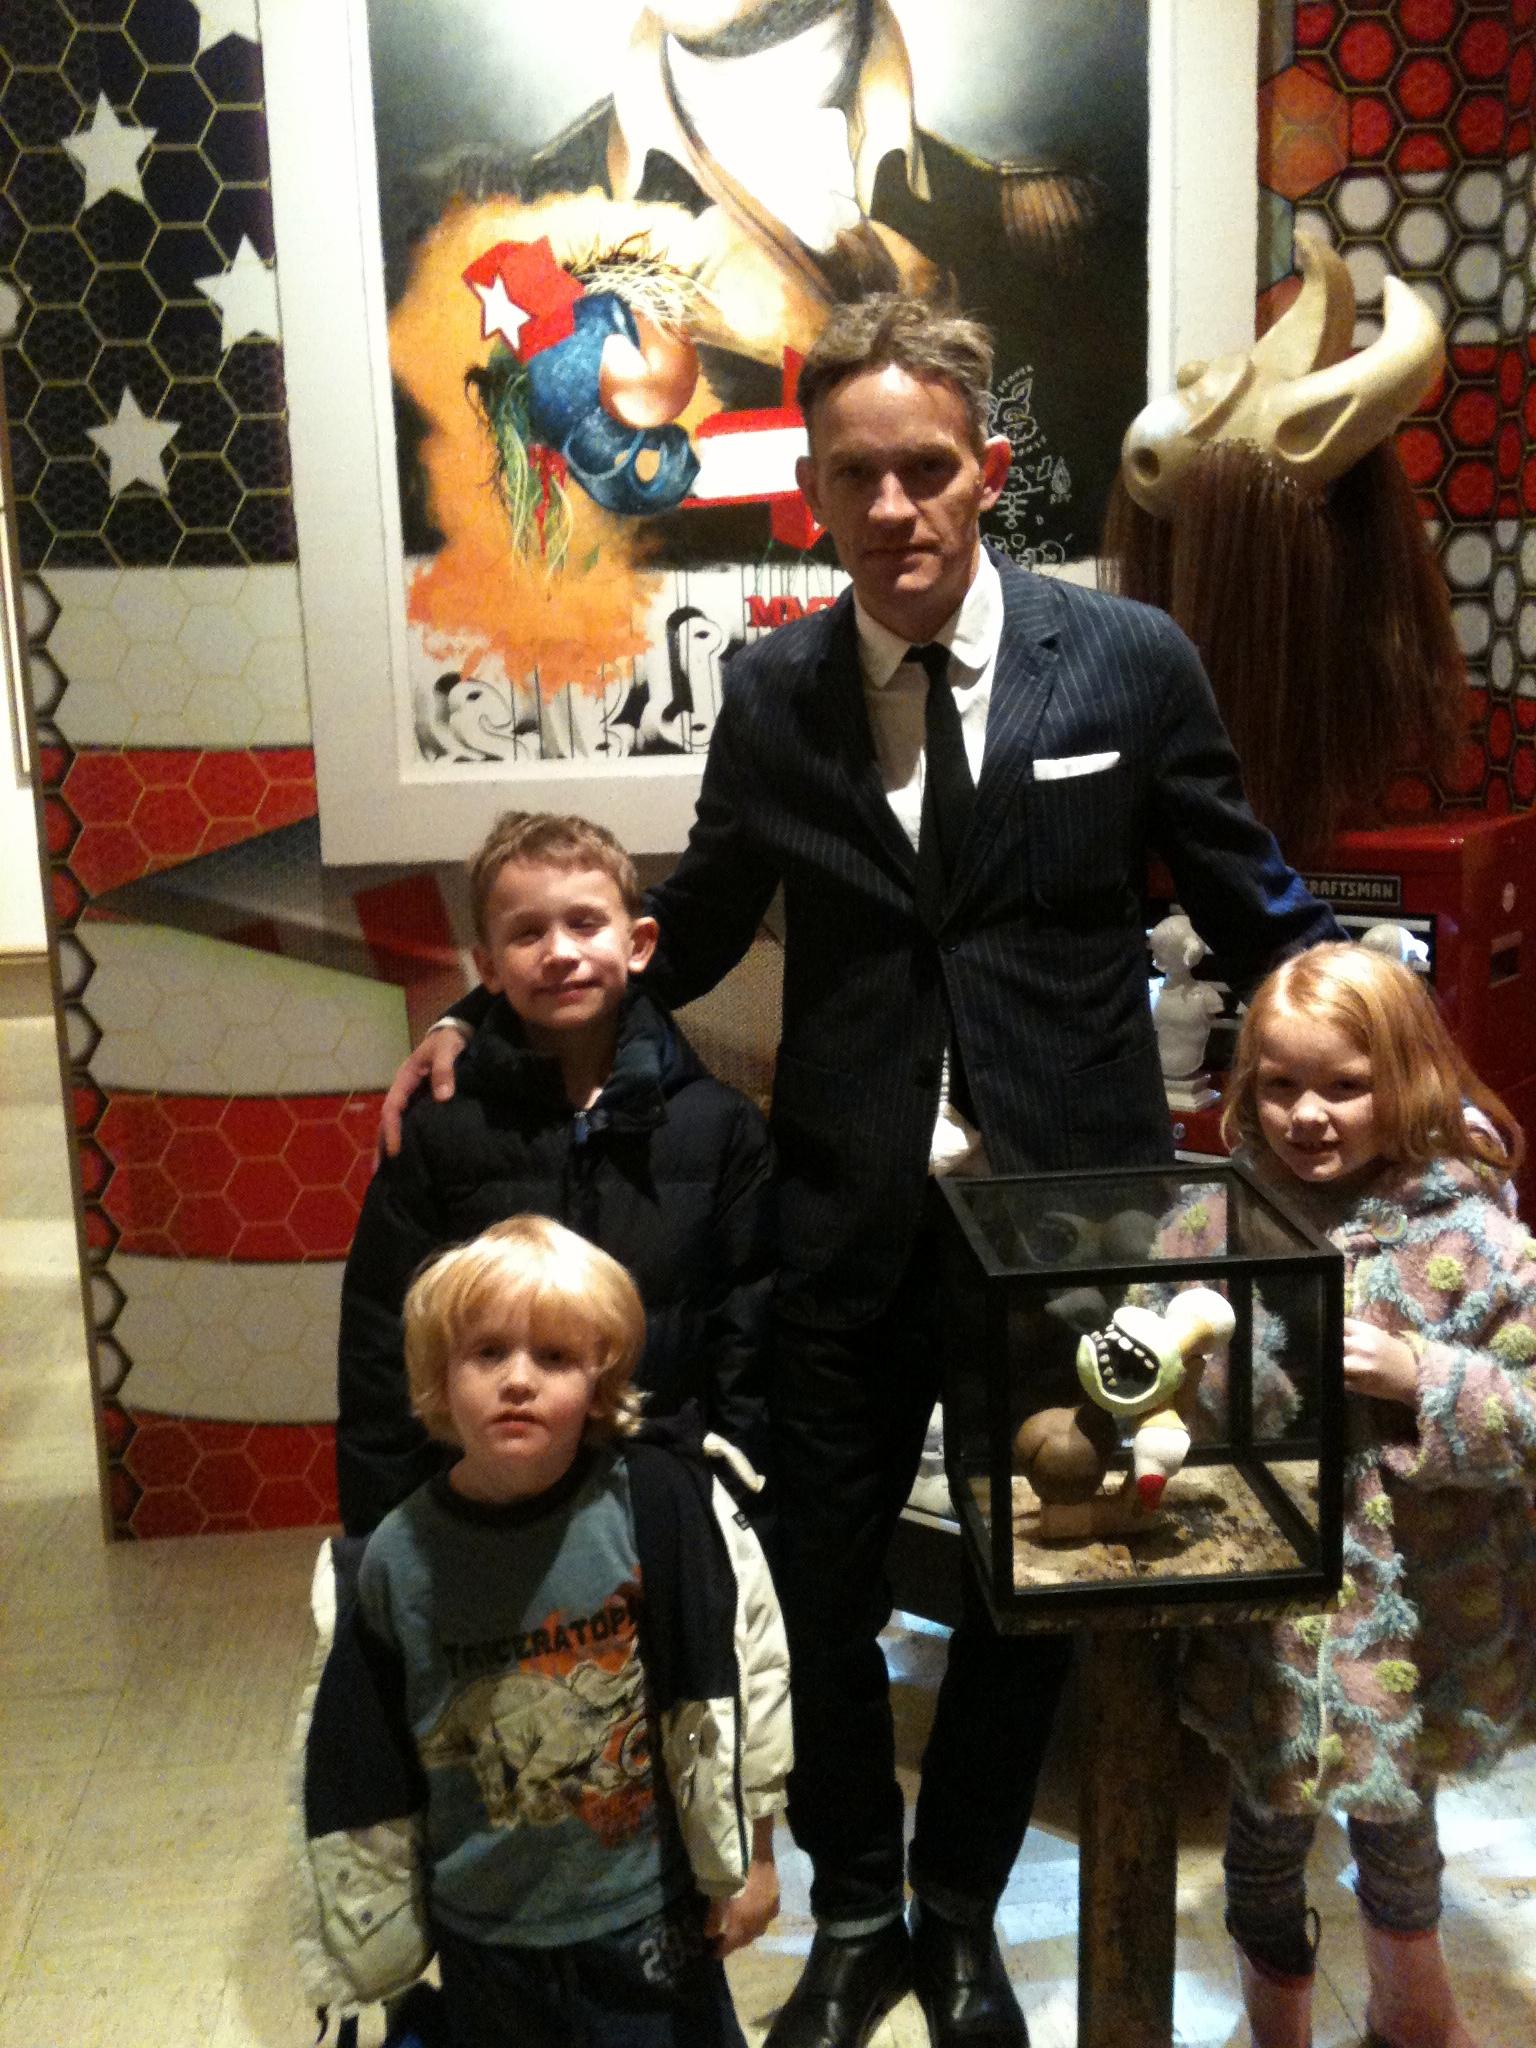 Grand re-opening, Elliott Earls with his kids